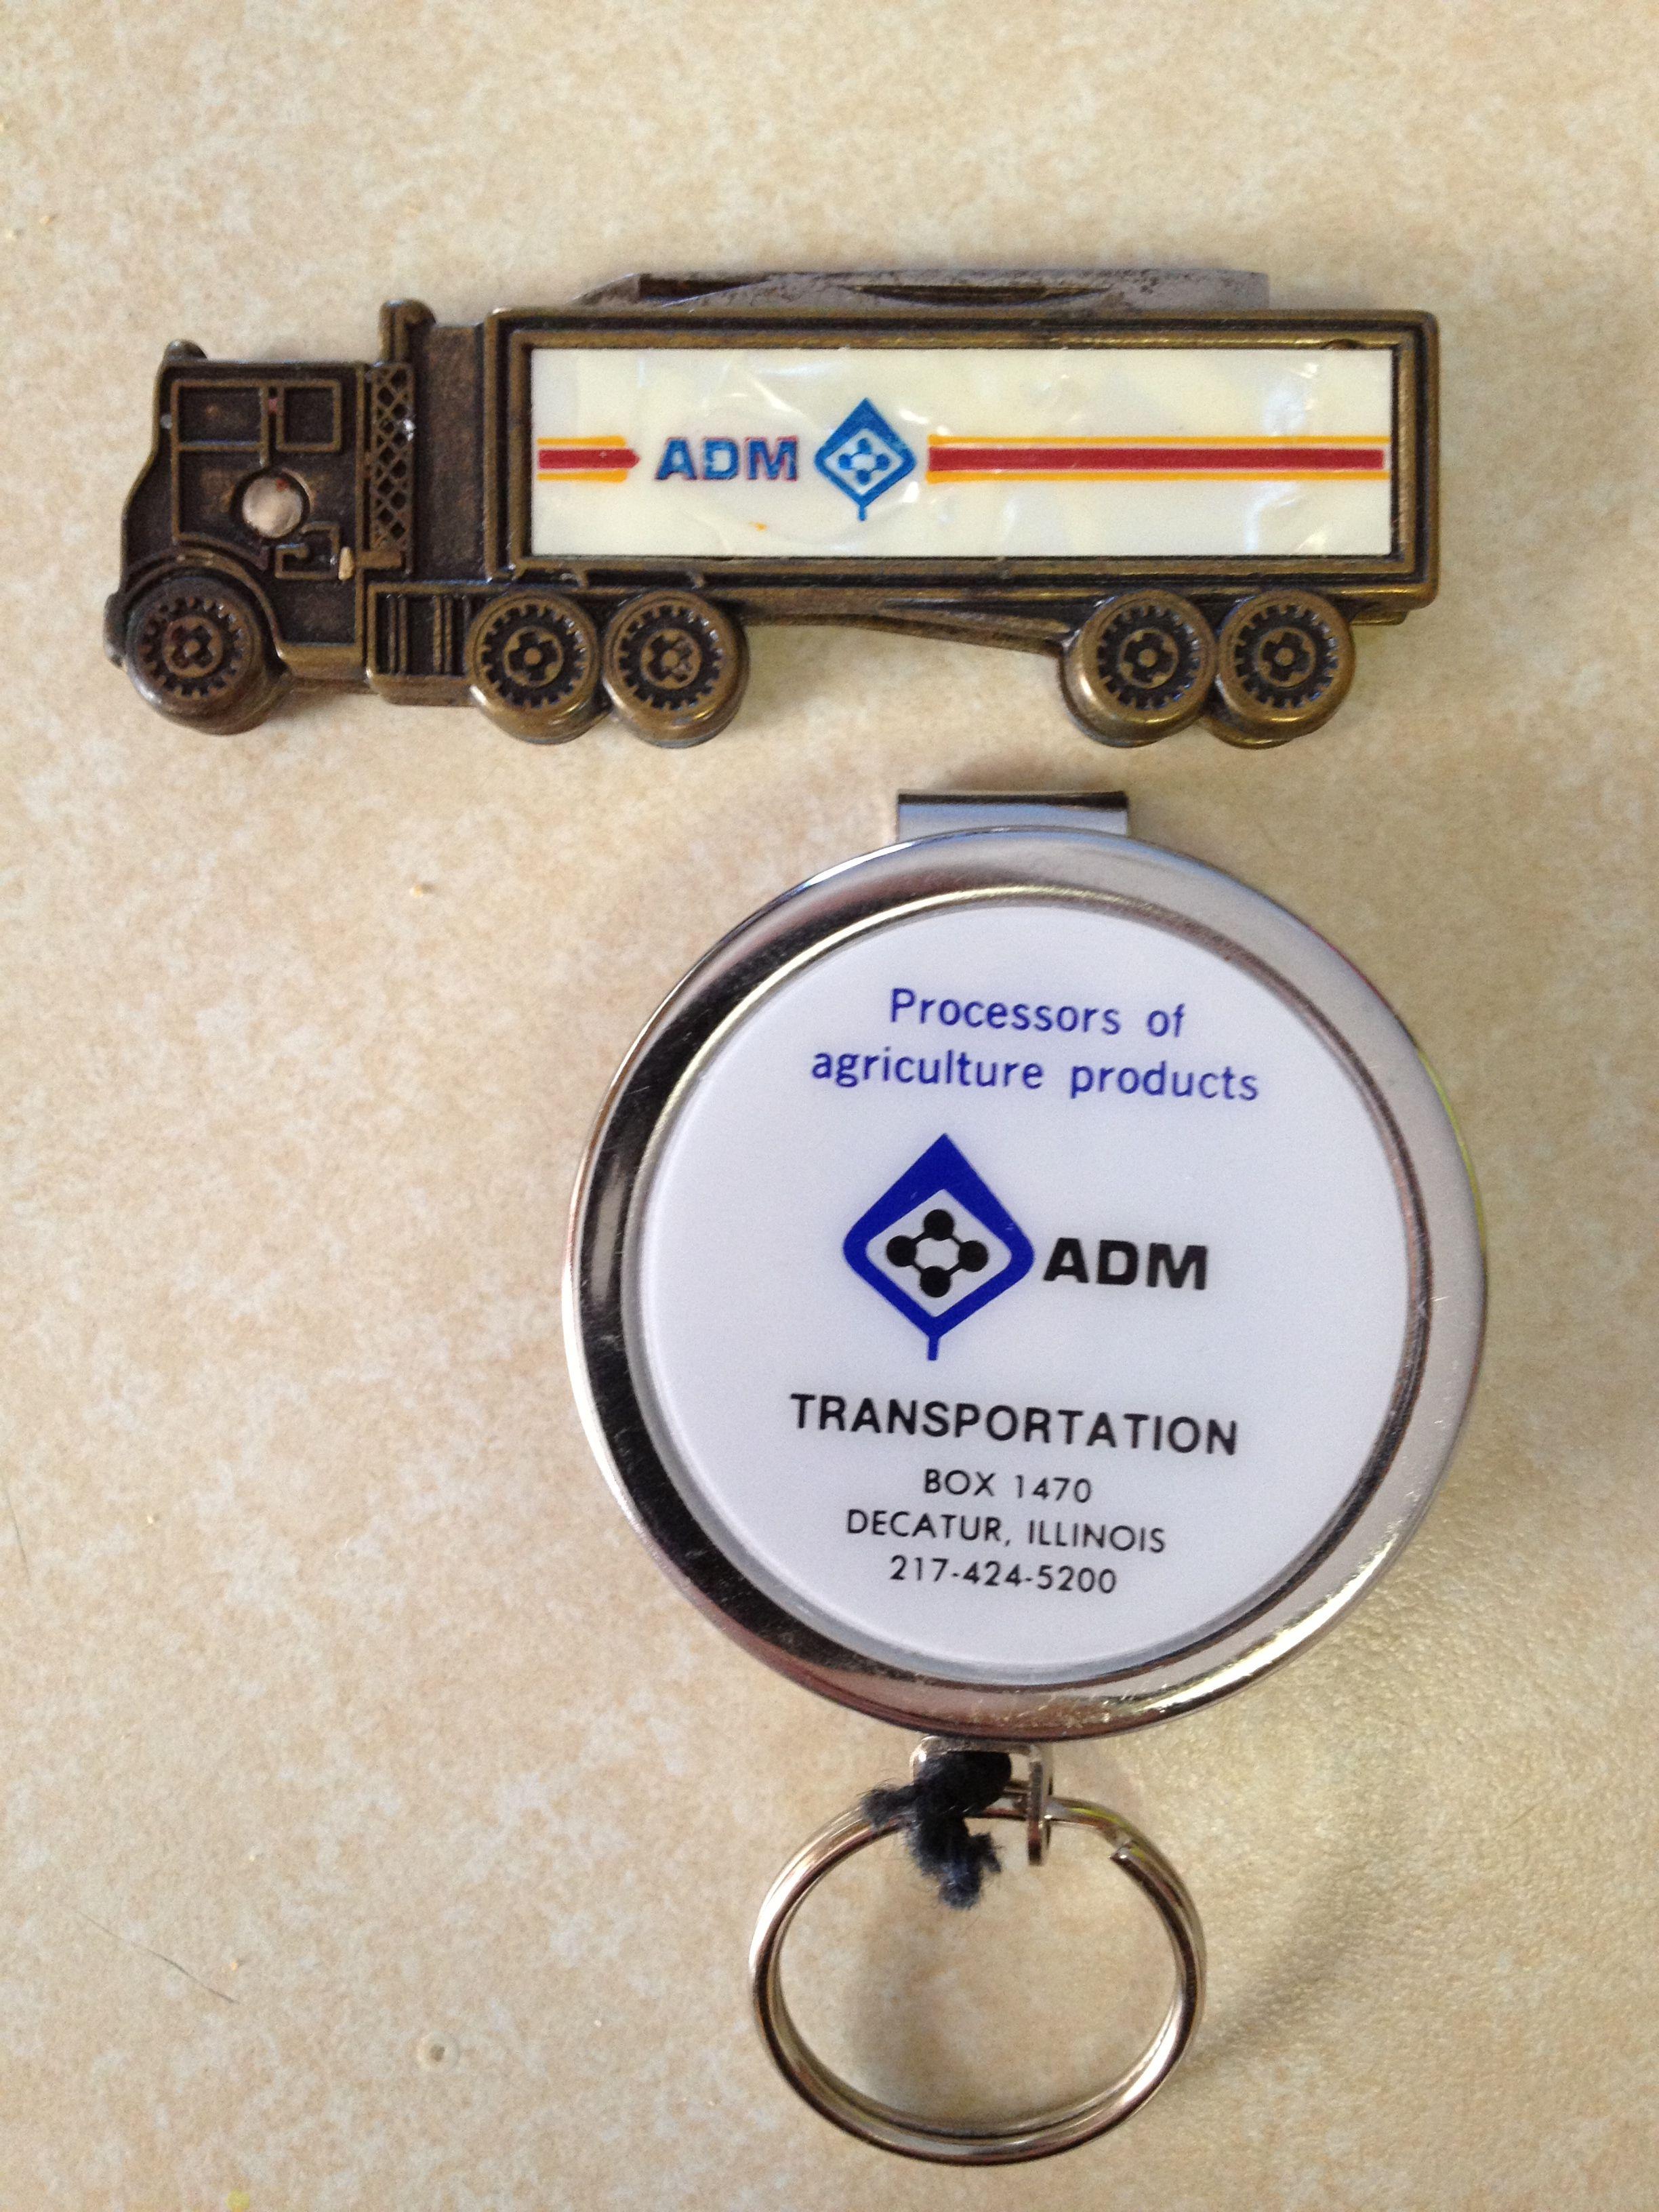 pocket knife and key holder; ADM Transportation; ADM ...